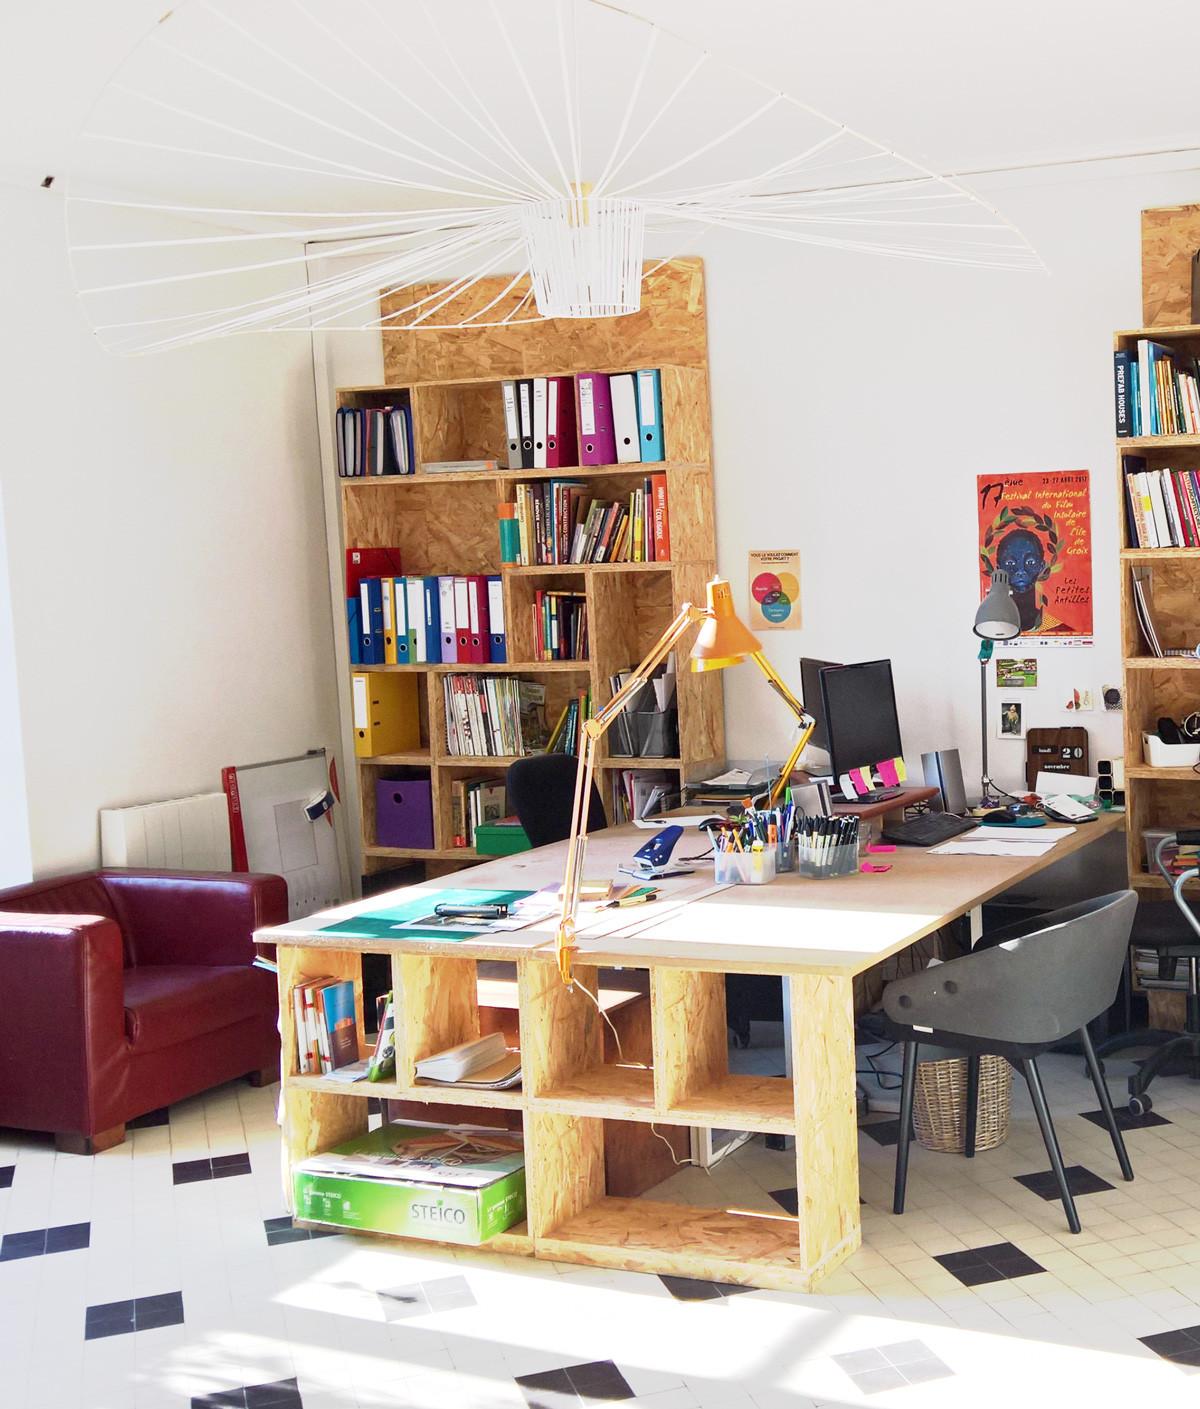 Optimix -  / Espace de coworking dans le Morbihan / Bureaux partagés / La Roche-Bernard